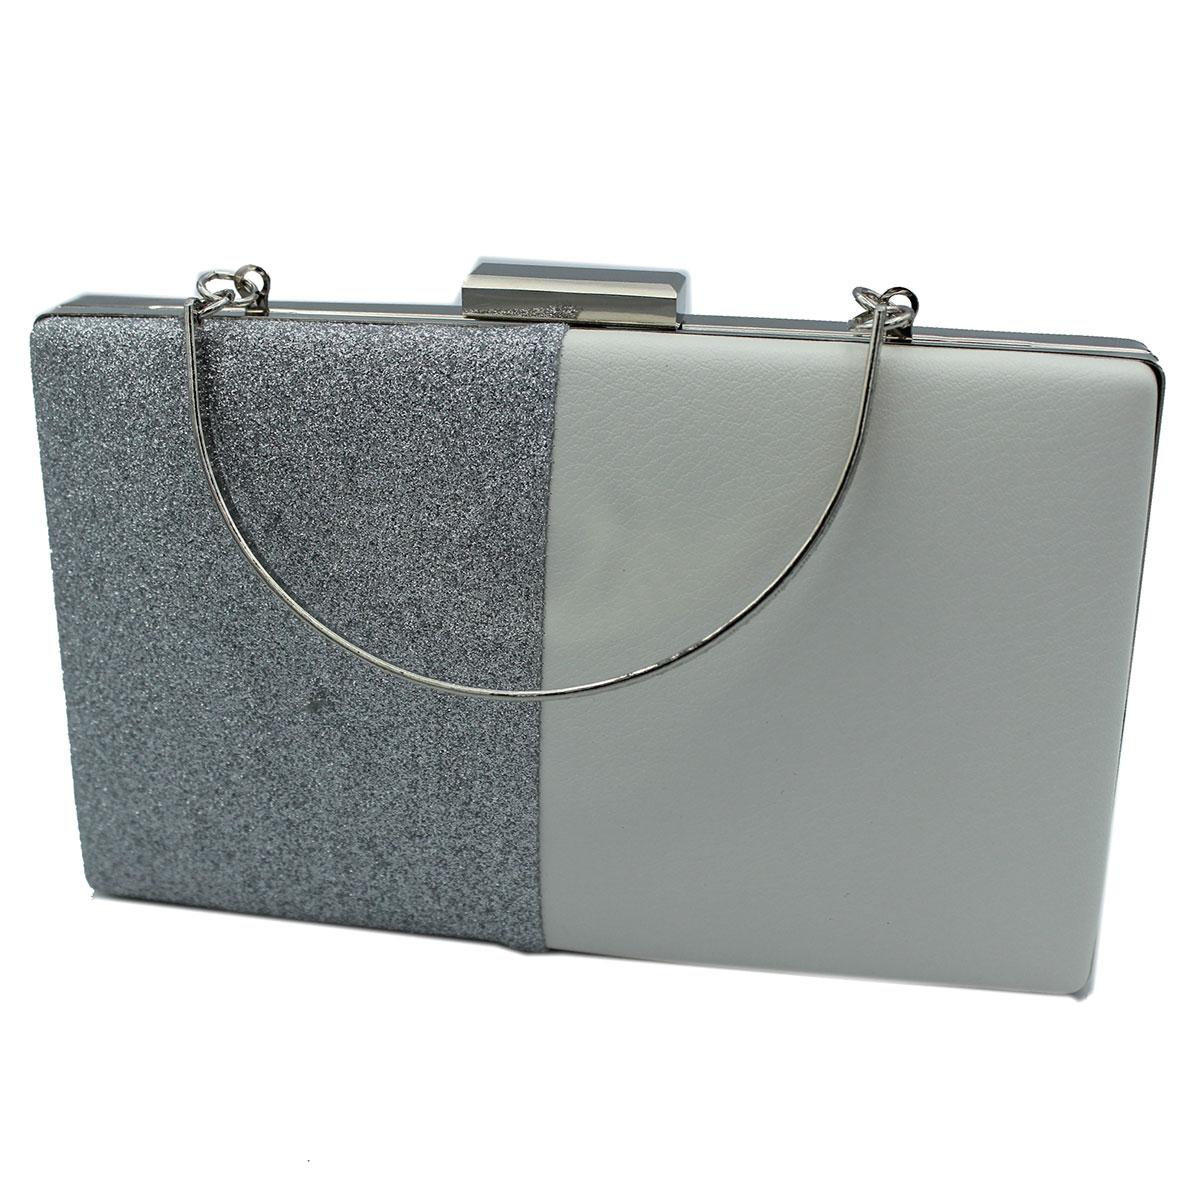 72493fb0a4 Borsetta donna pochette da sera clutch similpelle MICHELLE MOON v4087  argento